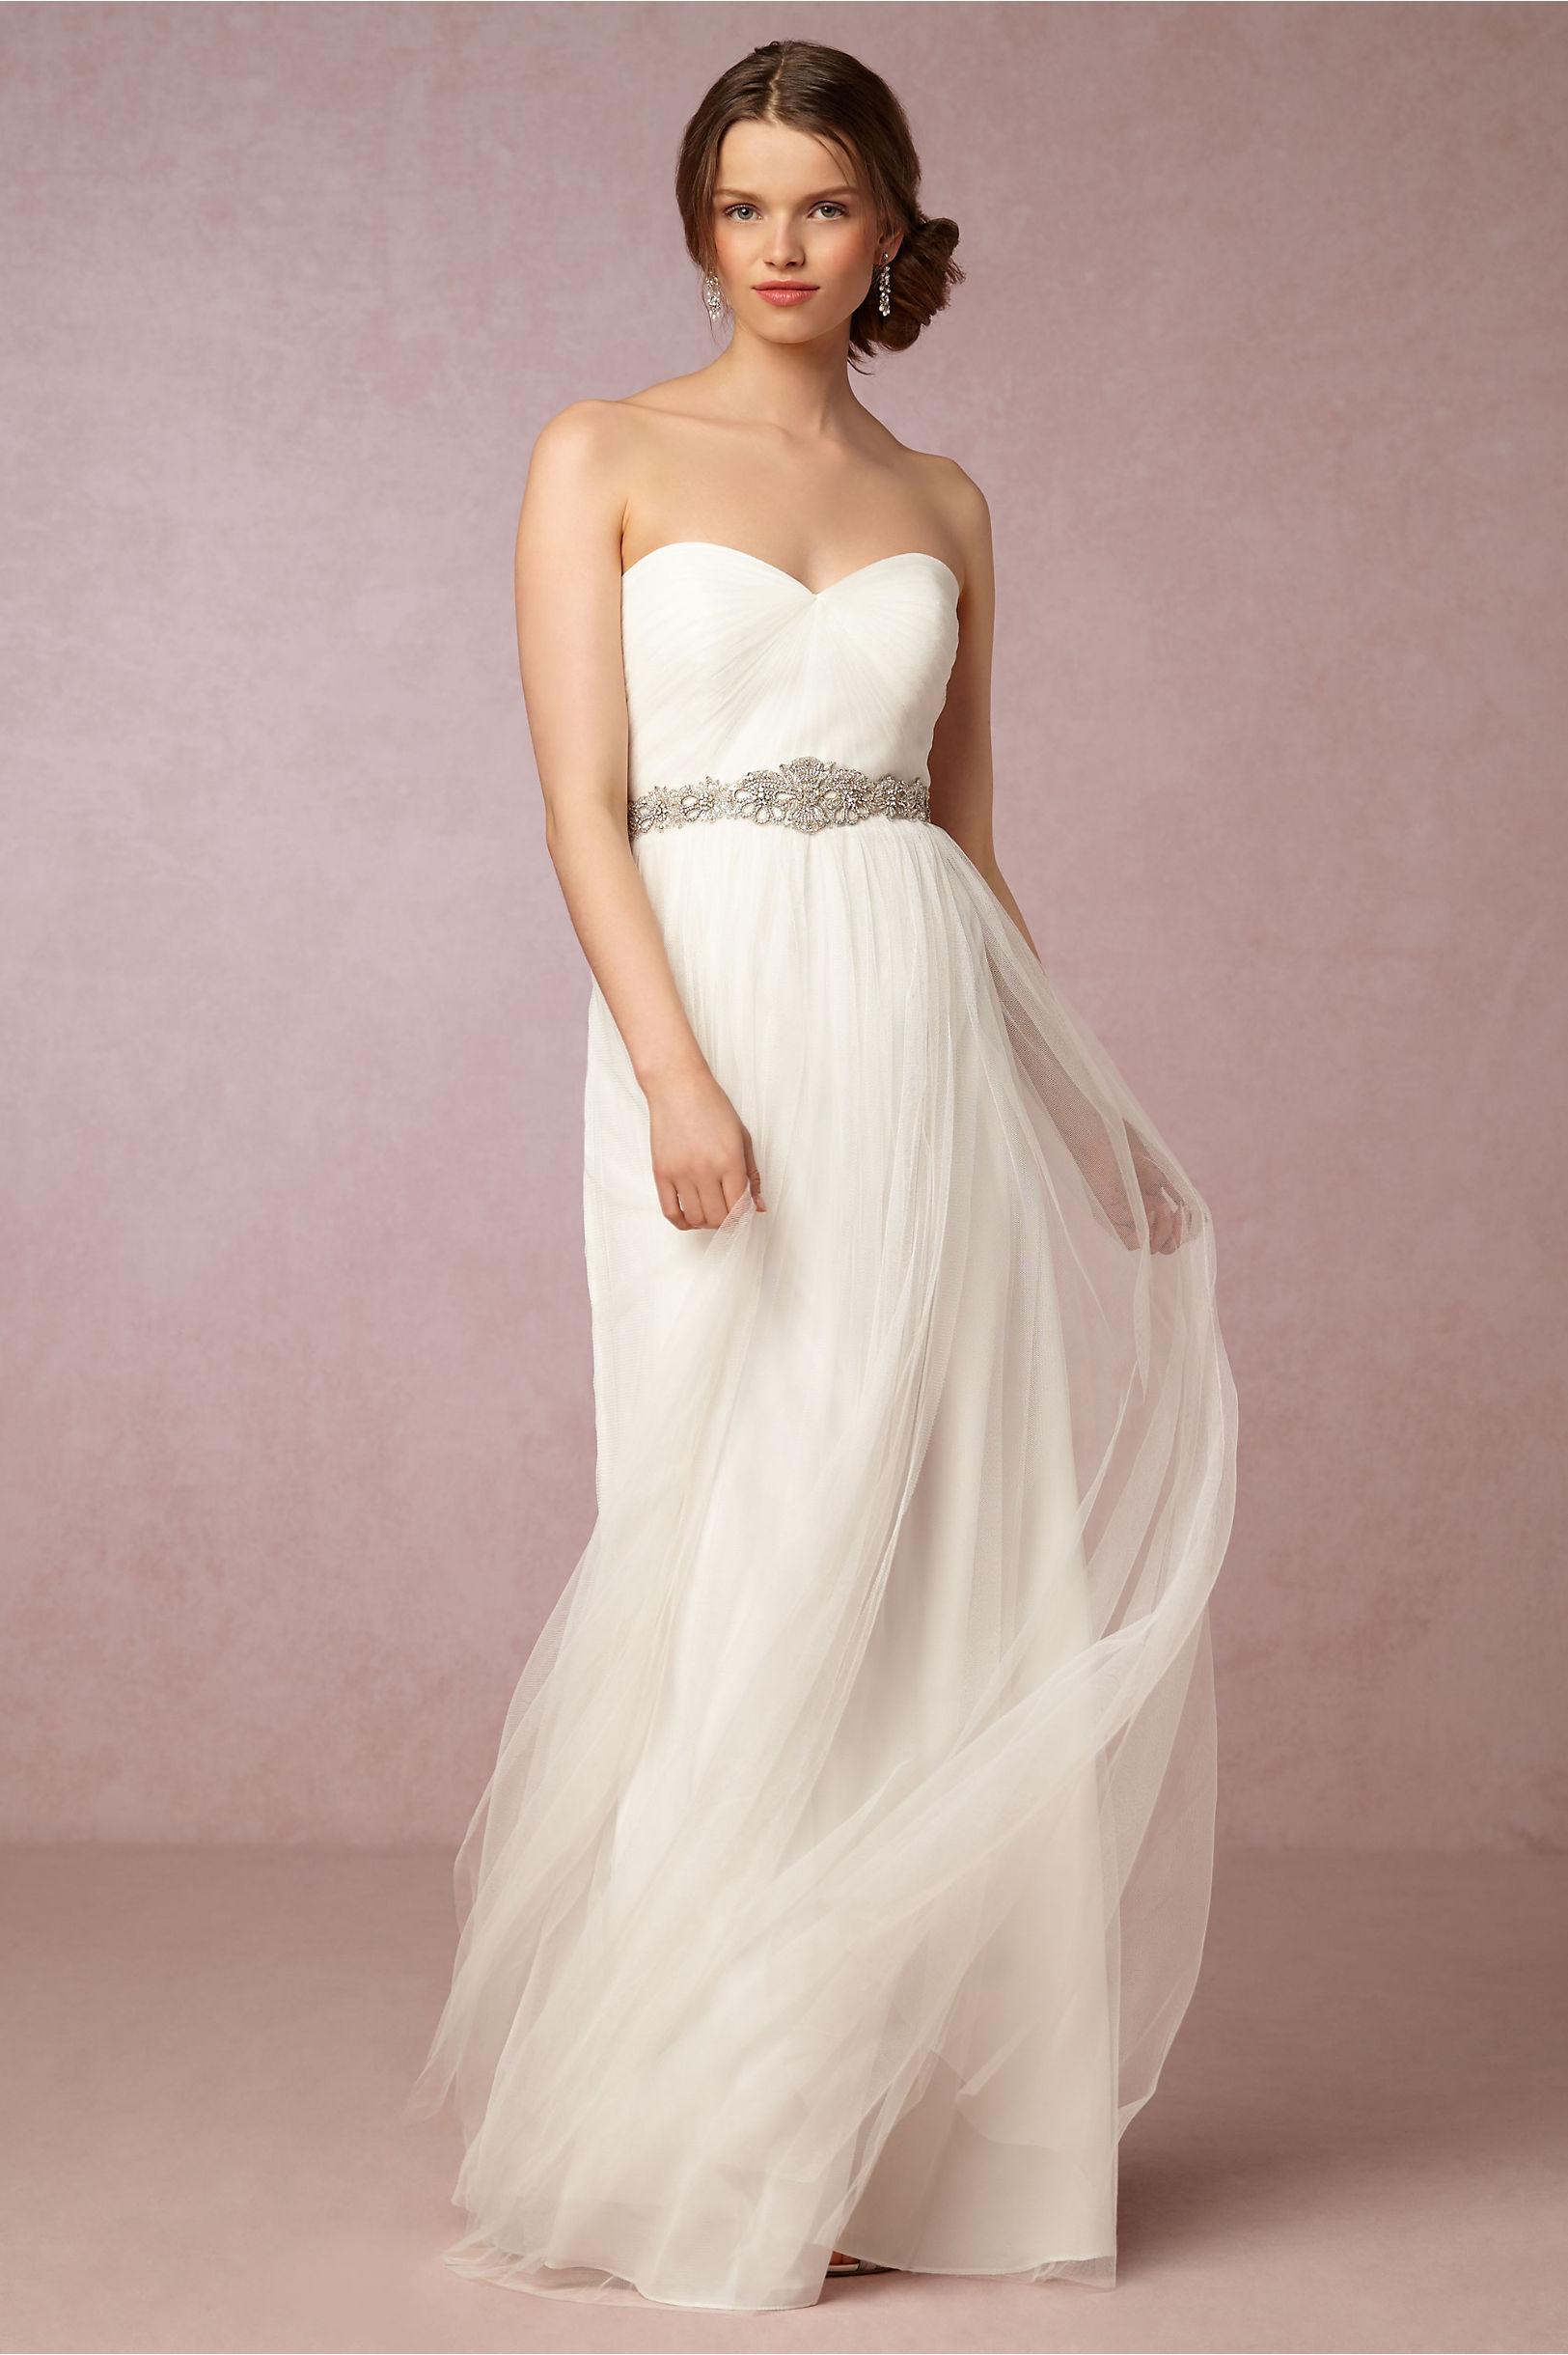 annabelle dress ivory ivory wedding dress Ivory Annabelle Dress BHLDN